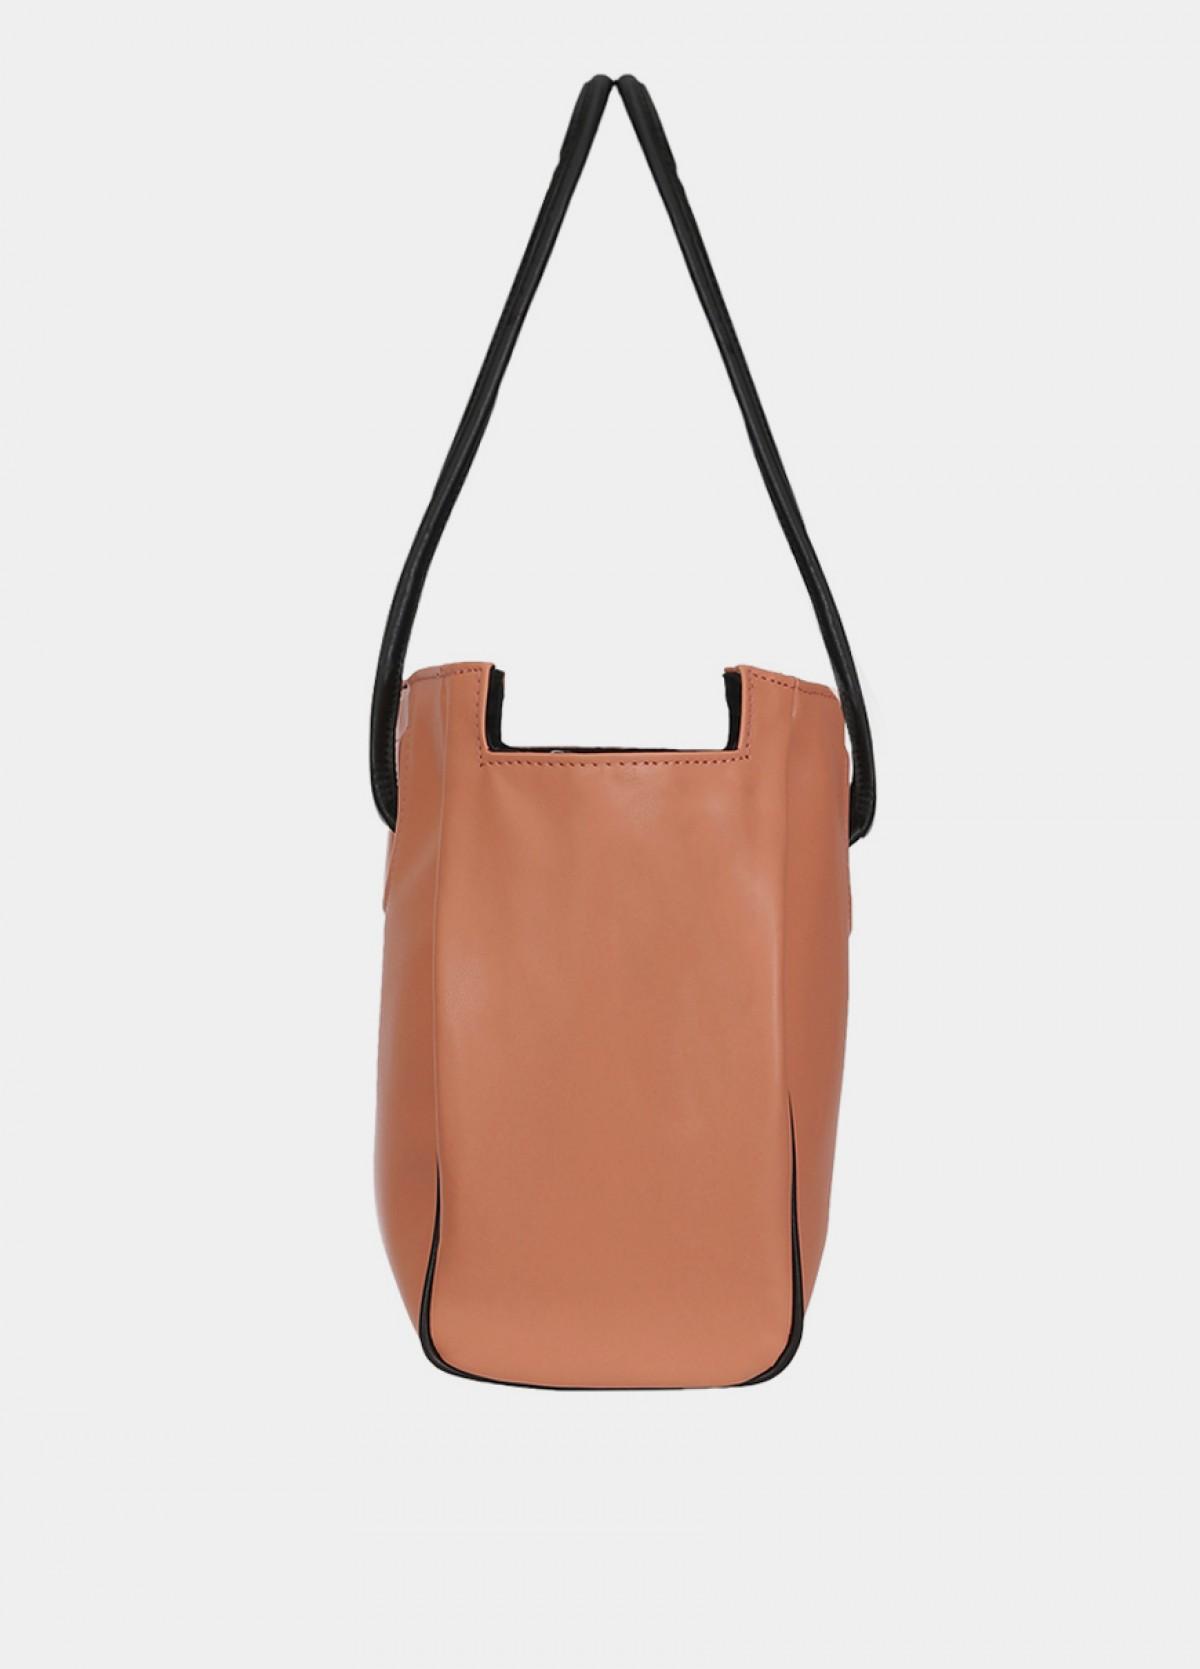 The Formal Peach Hand Bag